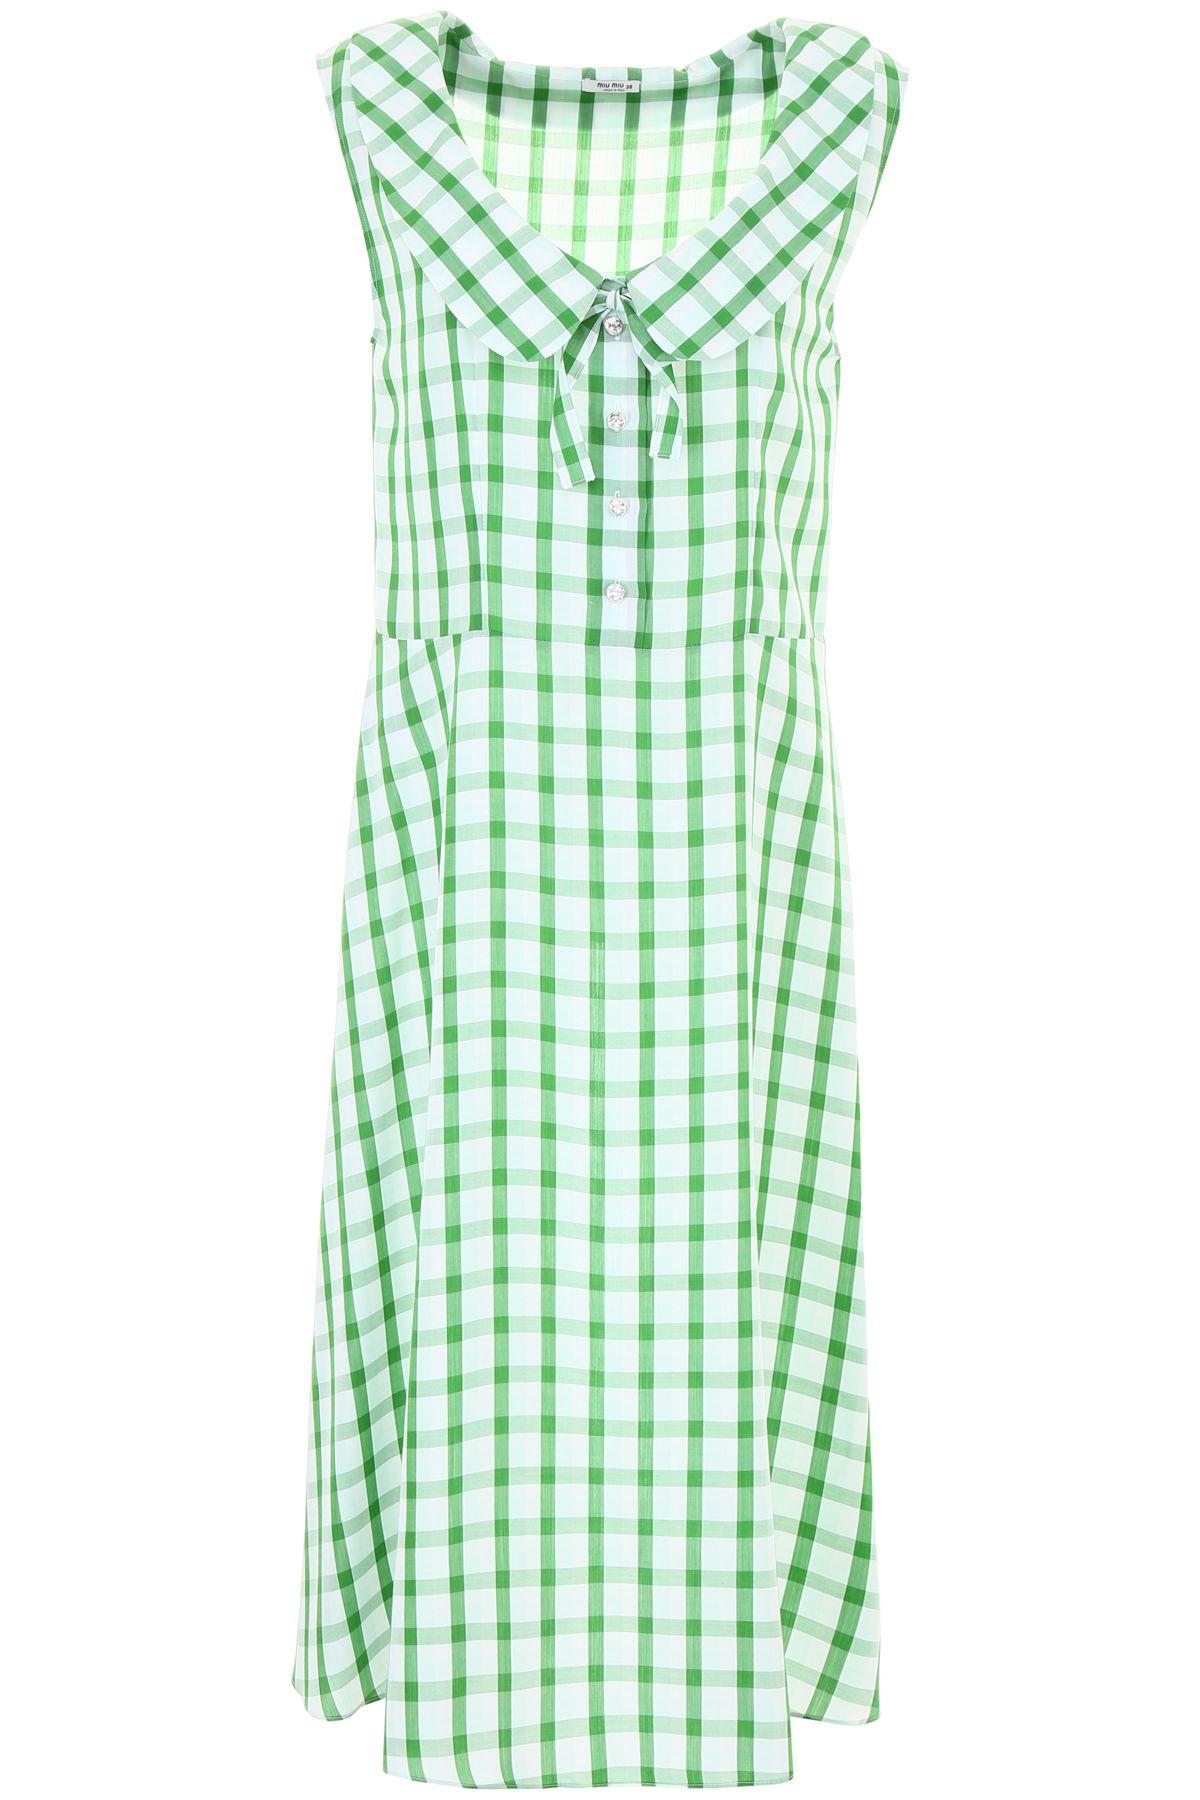 Miu Miu Check Dress